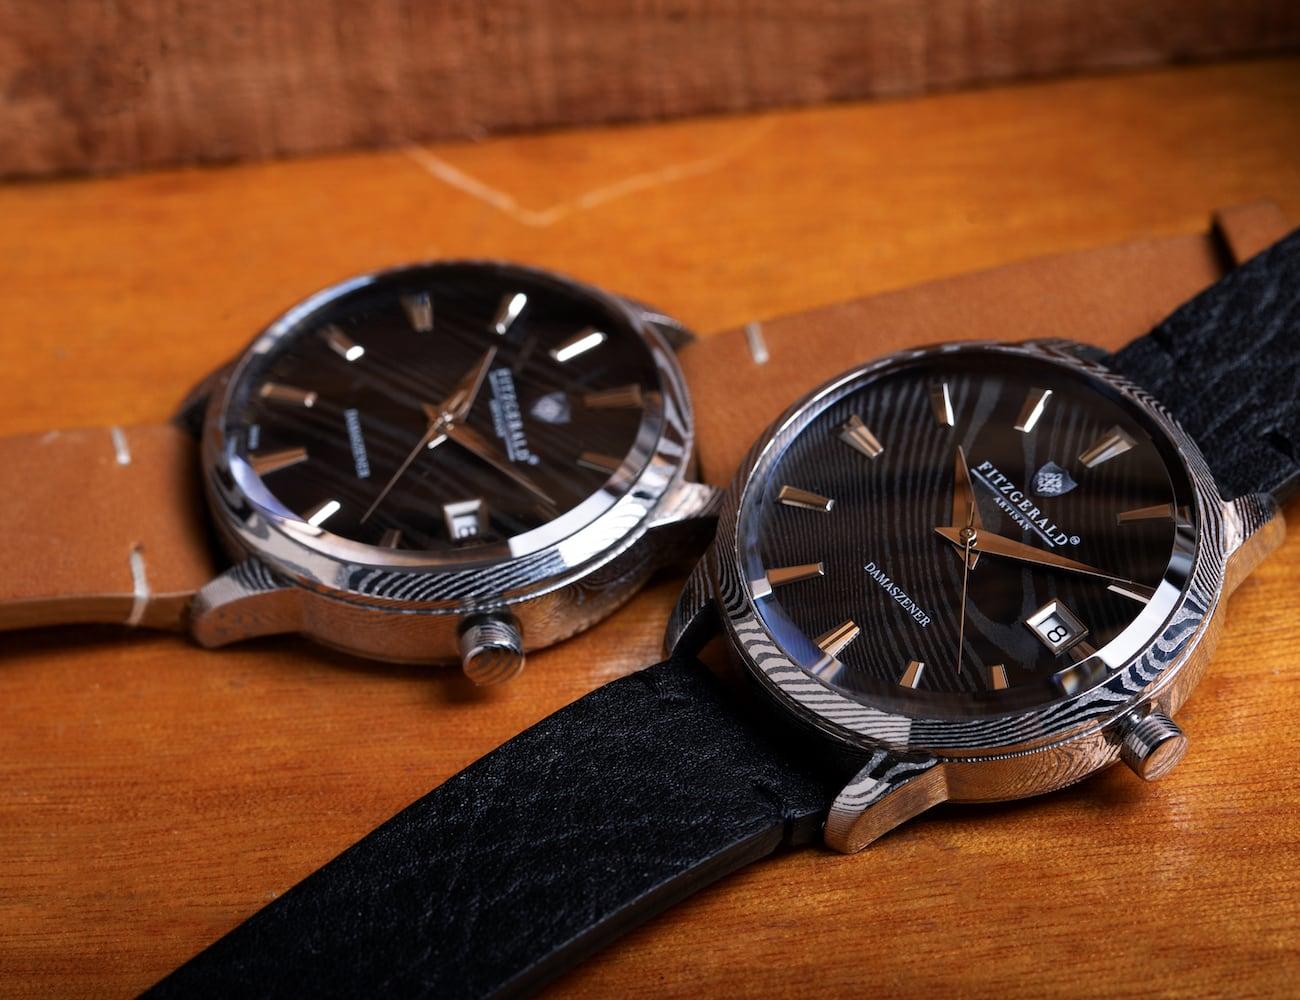 FITZGERALD Automatic Damascus Steel Watch boasts a unique design